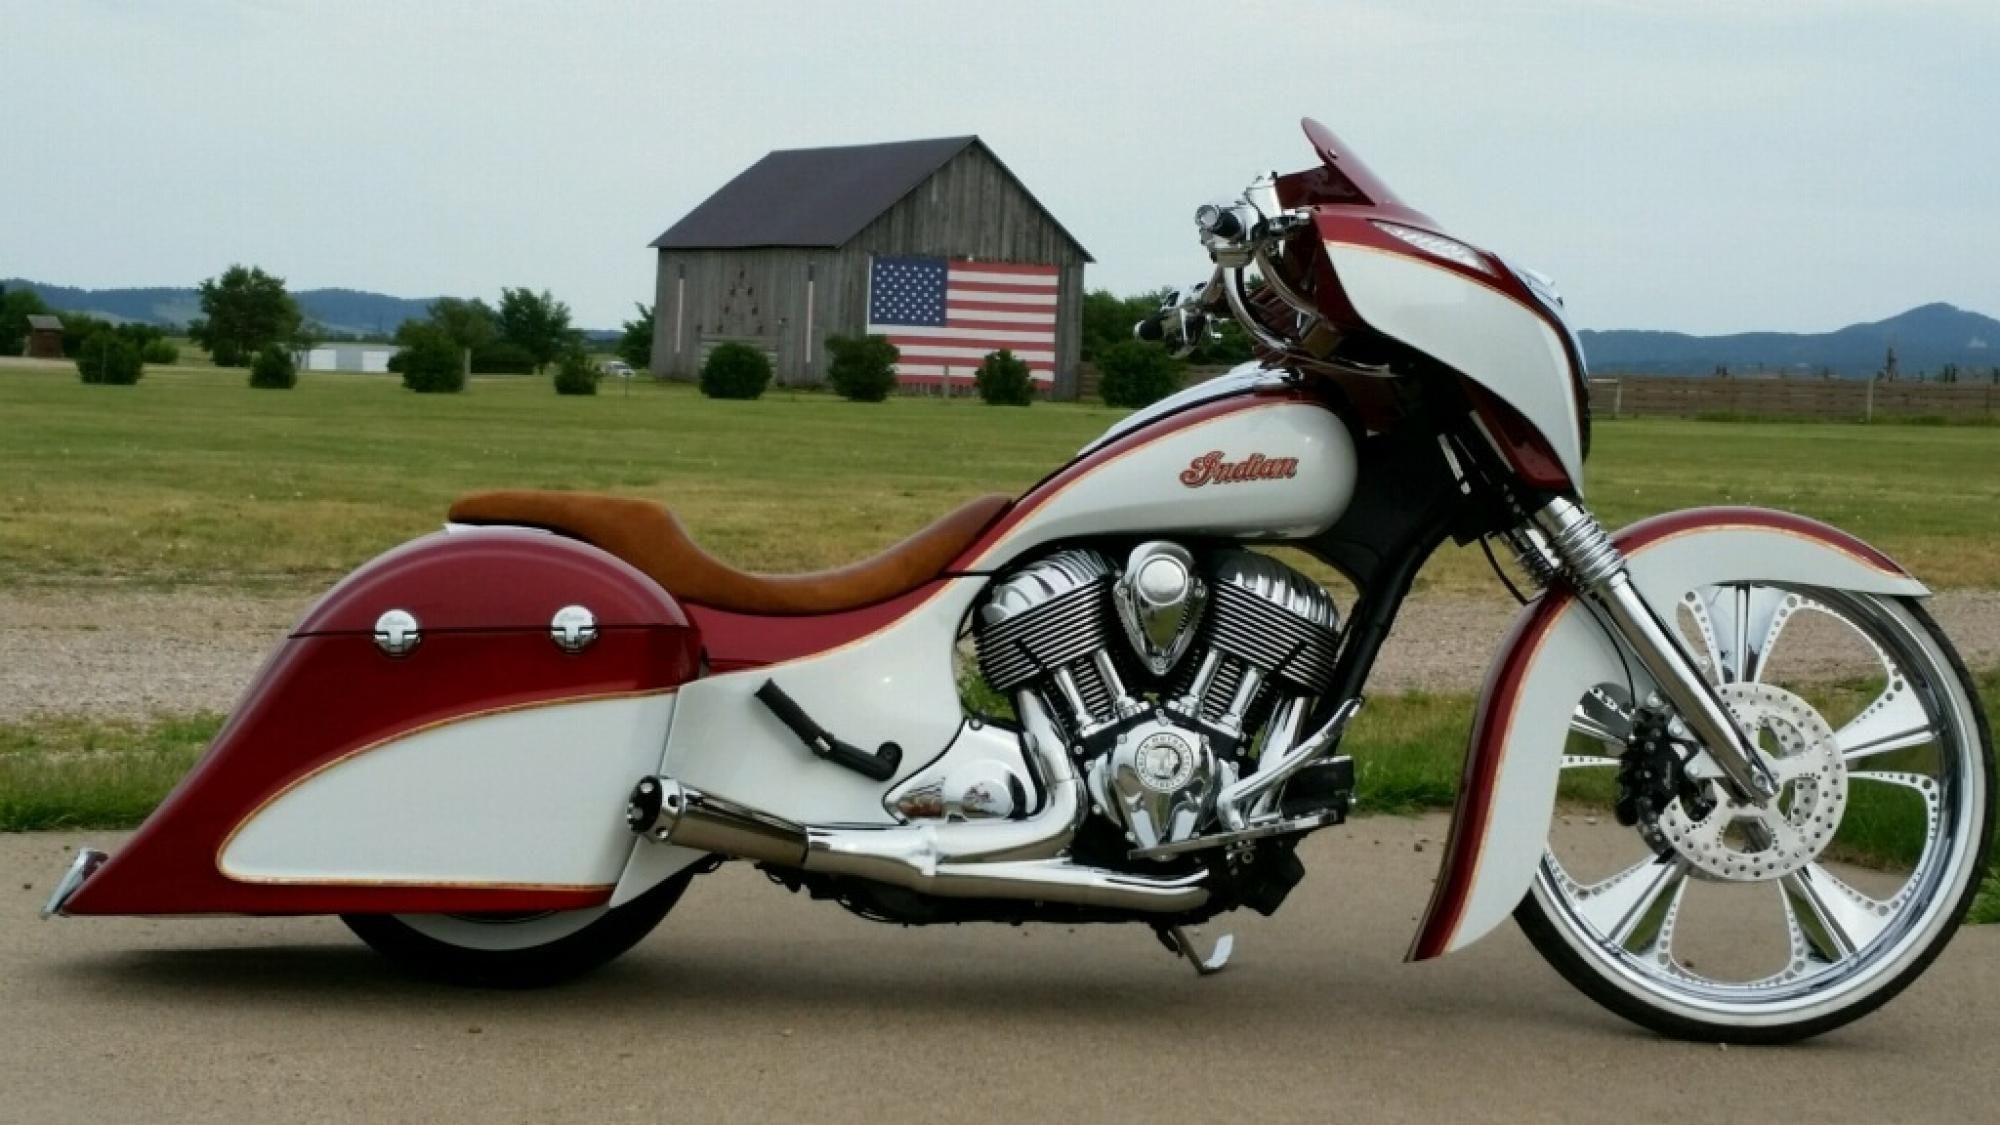 custom Indian bagger Victory Motorcycles Motorcycle